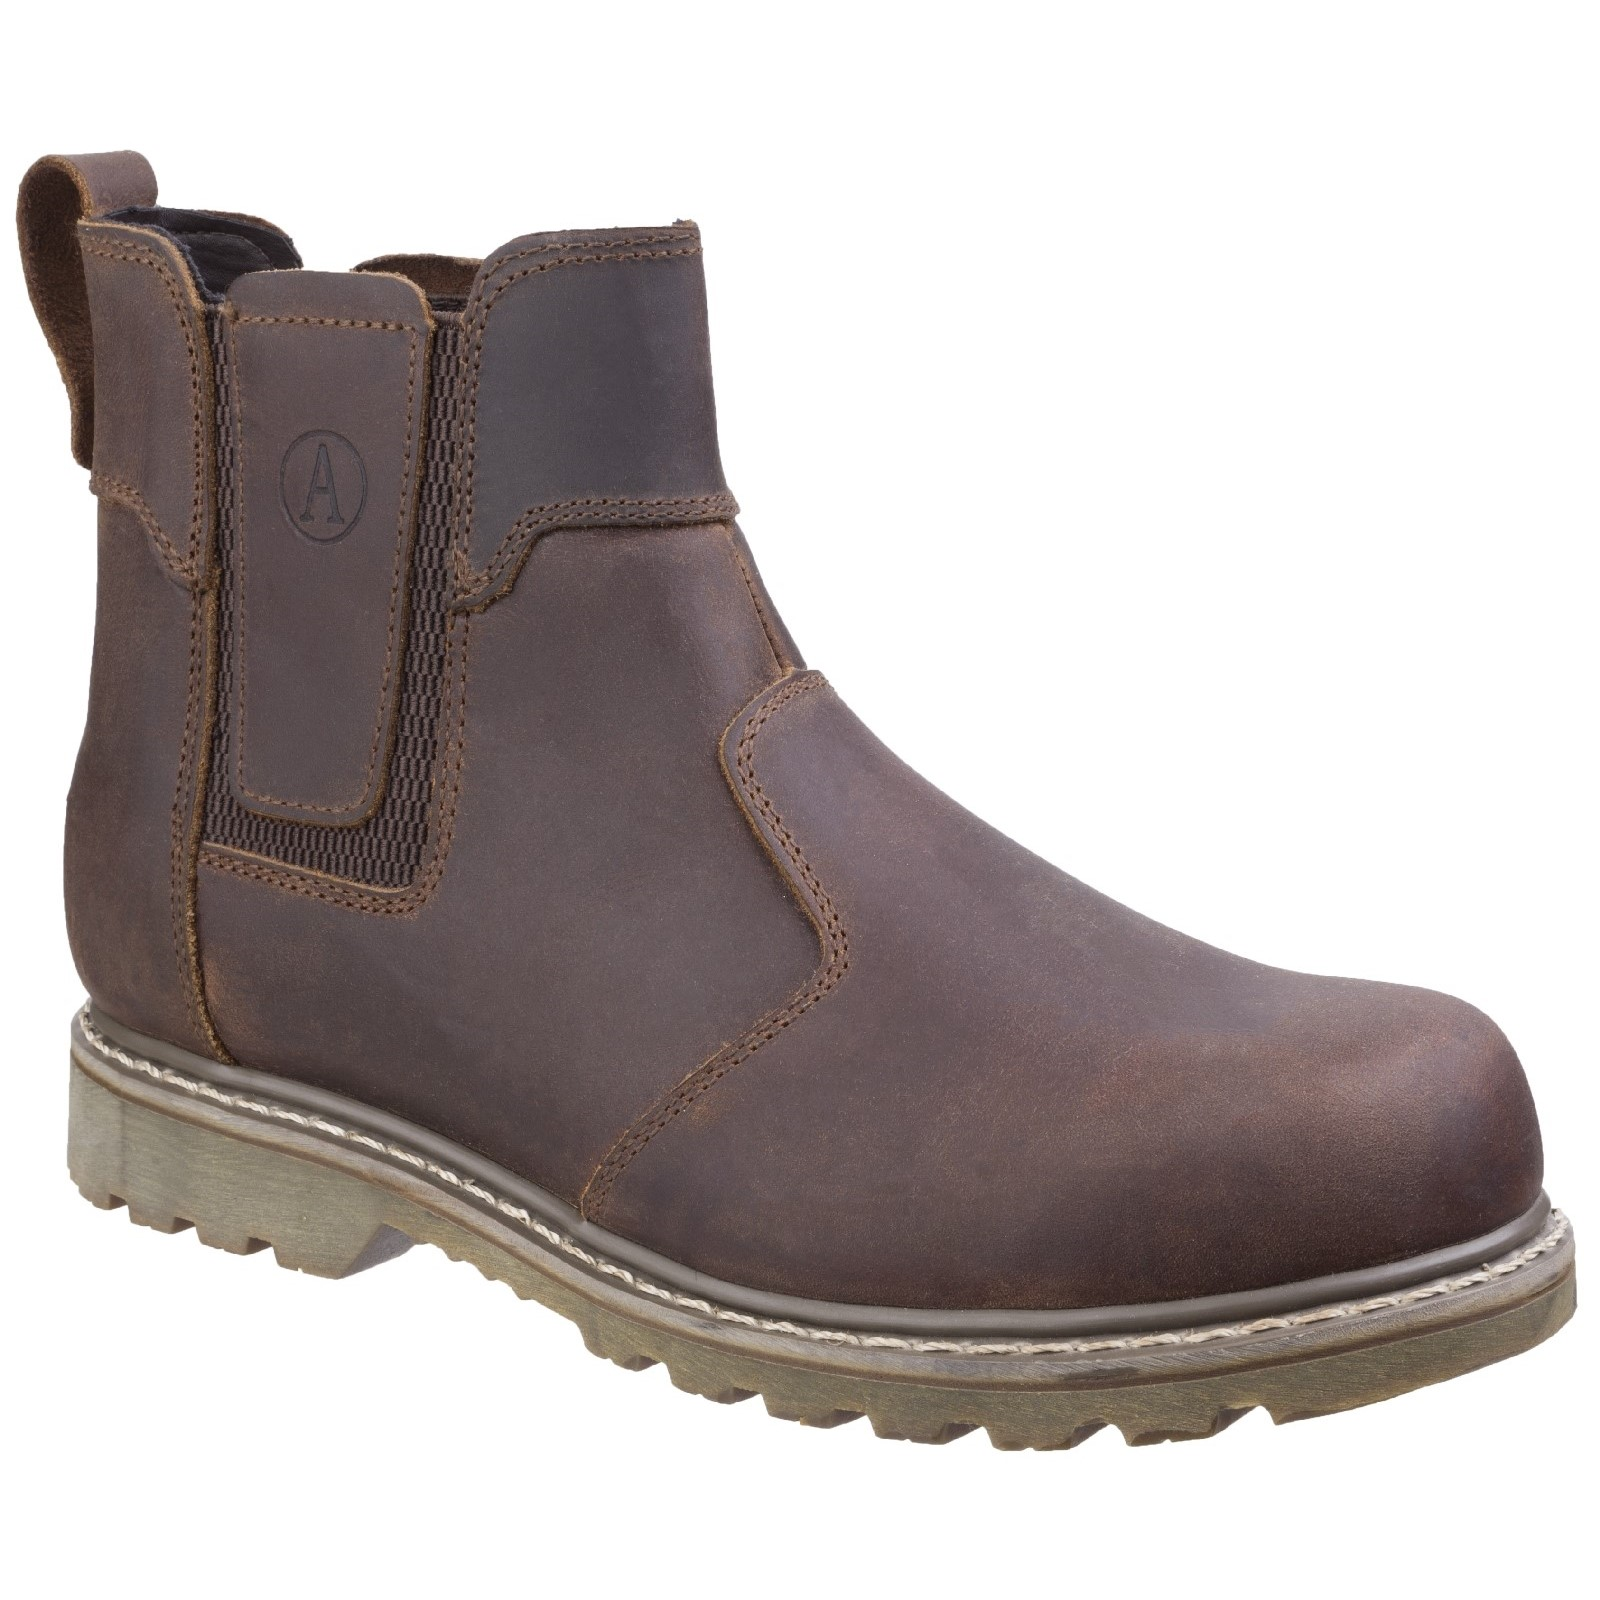 AME21_GEOX(43)   Sneakers GEOX 43     Grigio 6fa994